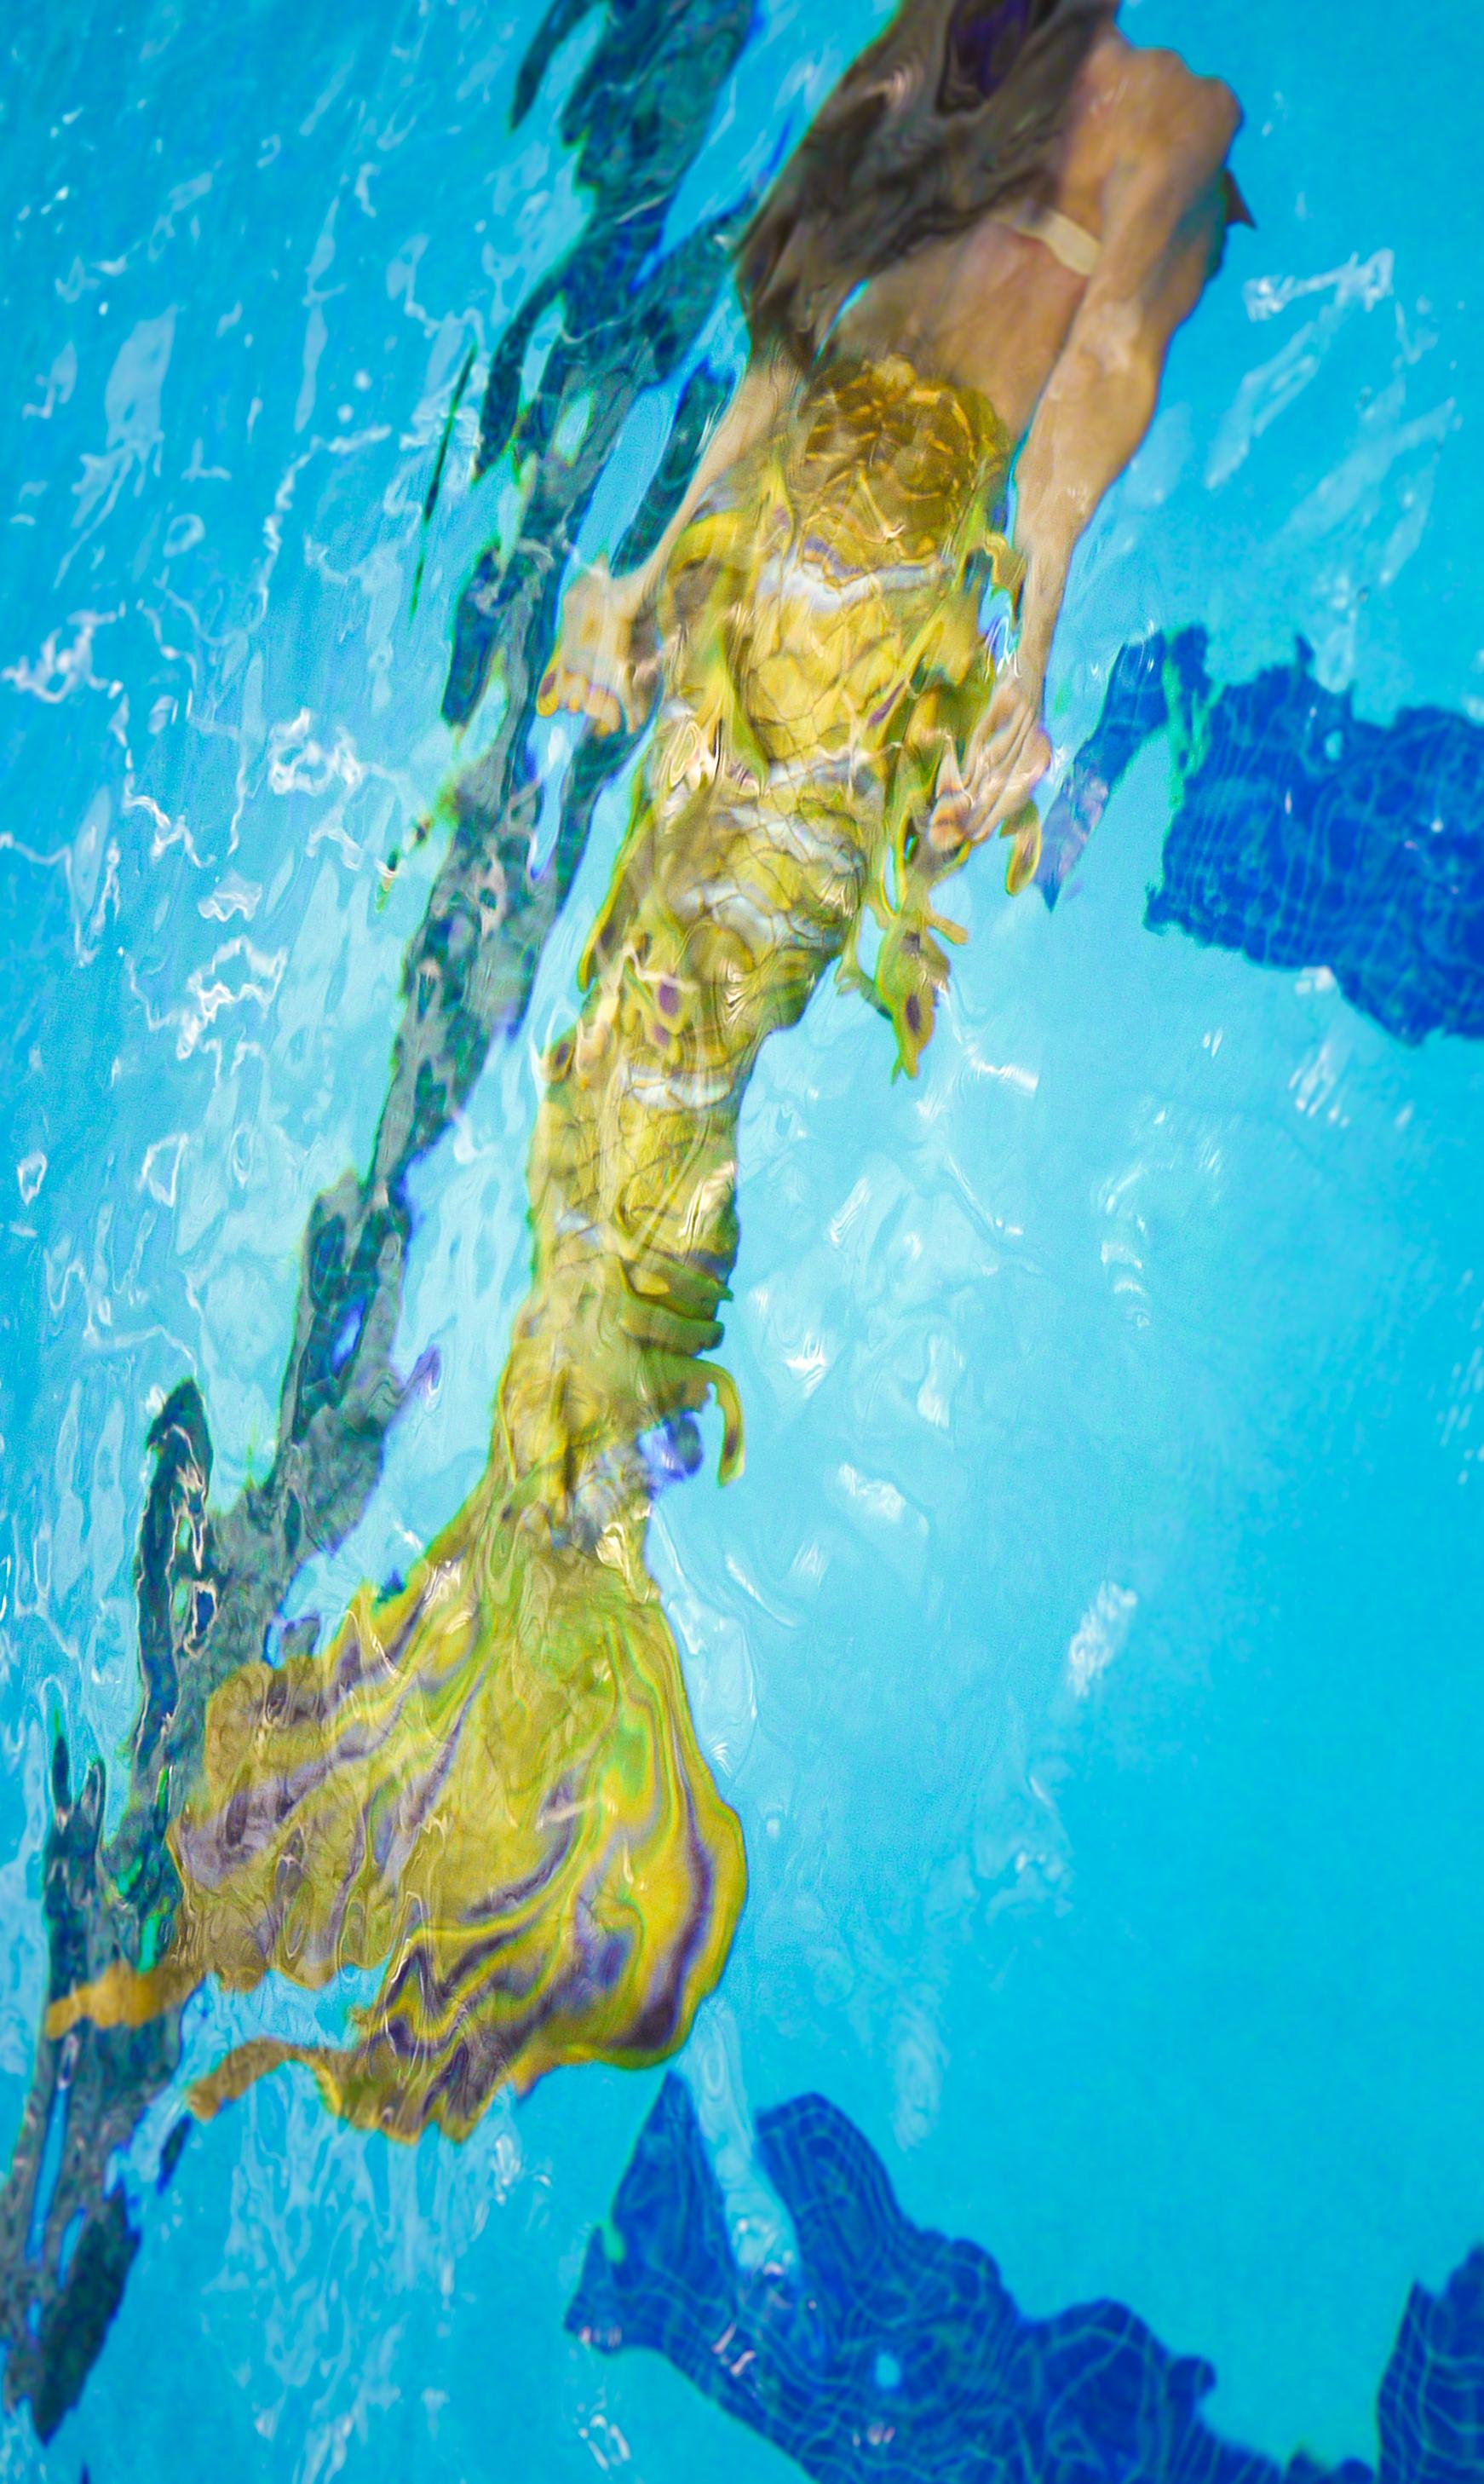 Swimming at Merfest 2015